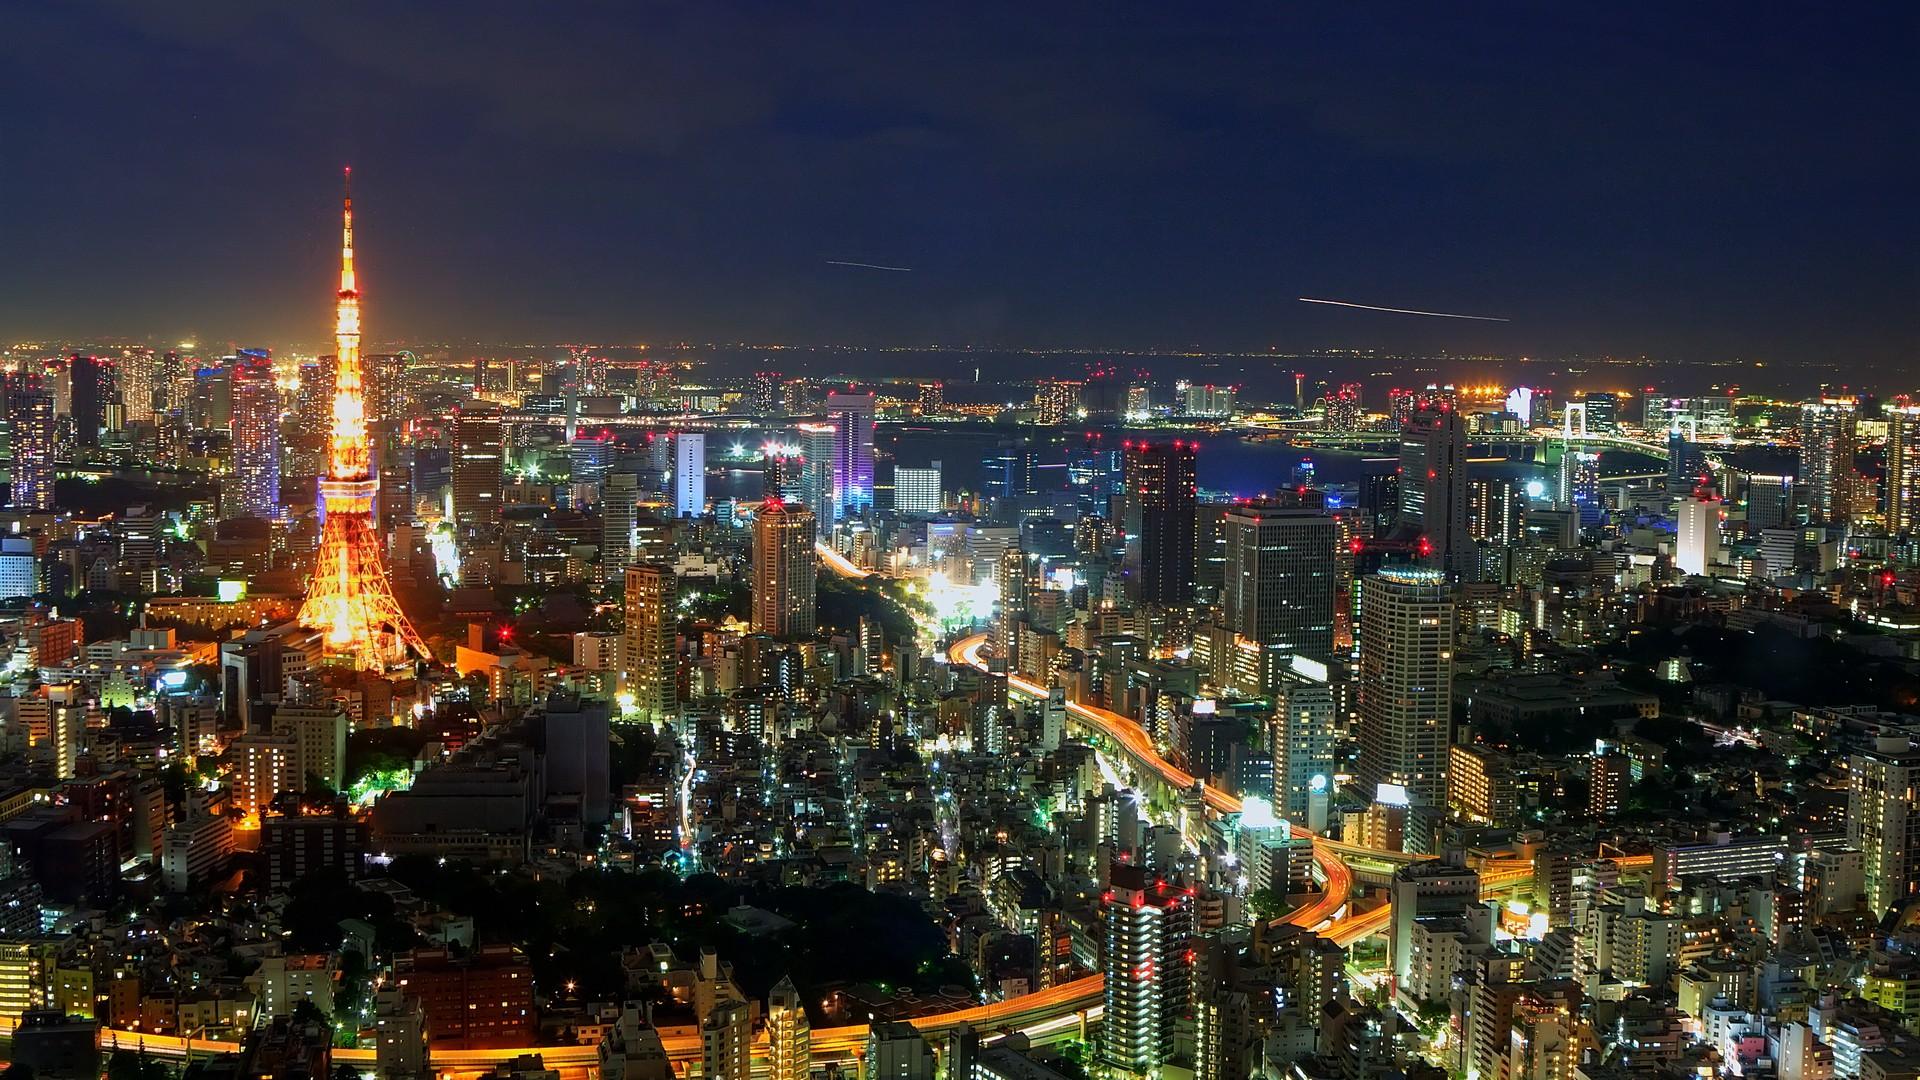 Japan Tokyo Wallpaper 1920x1080 Japan Tokyo Cityscapes Skyline 1920x1080